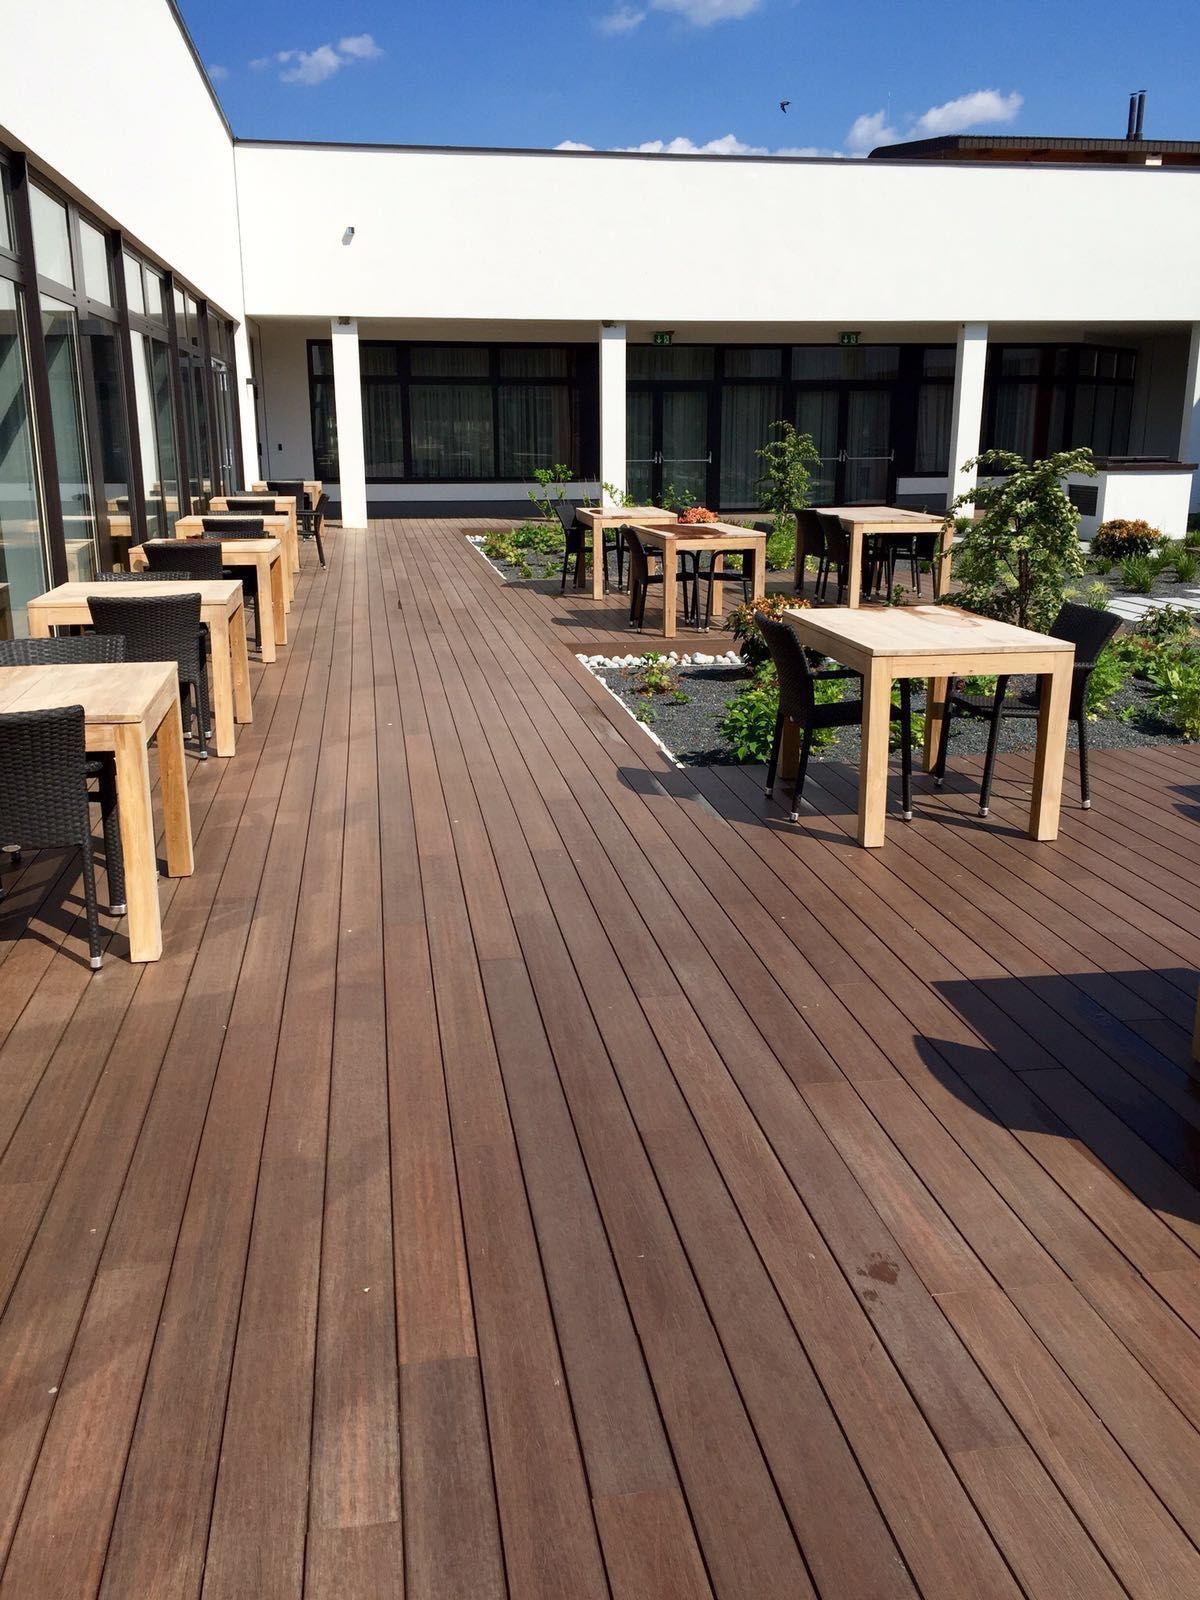 Outdoor Laminate Flooring Uk Laminate Flooring Ideas